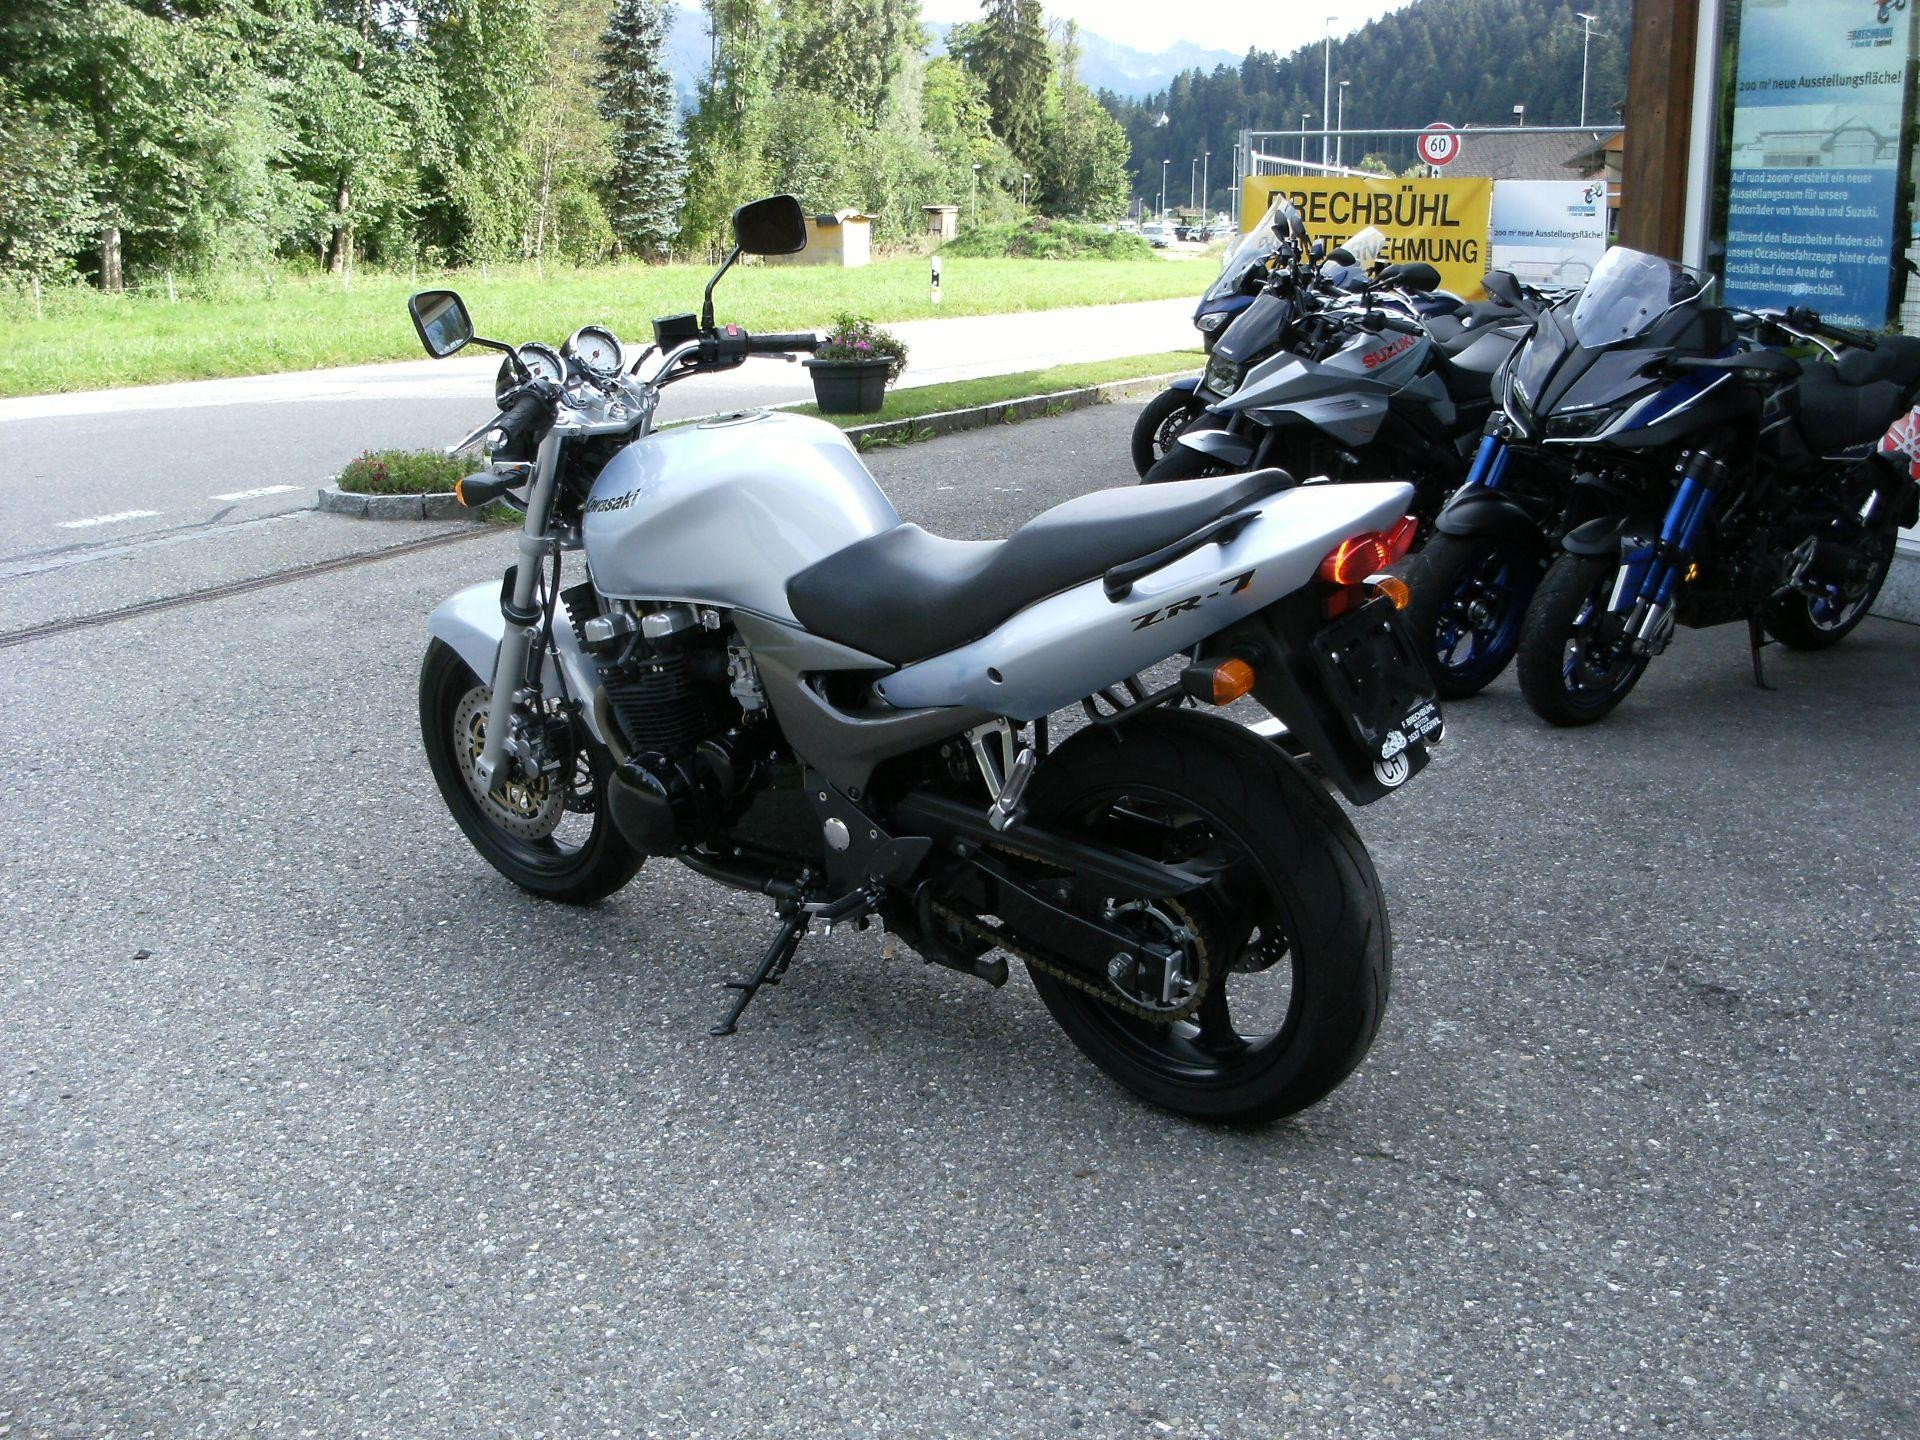 Motorrad Occasion kaufen KAWASAKI ZR-7 Brechbühl 2-Rad AG